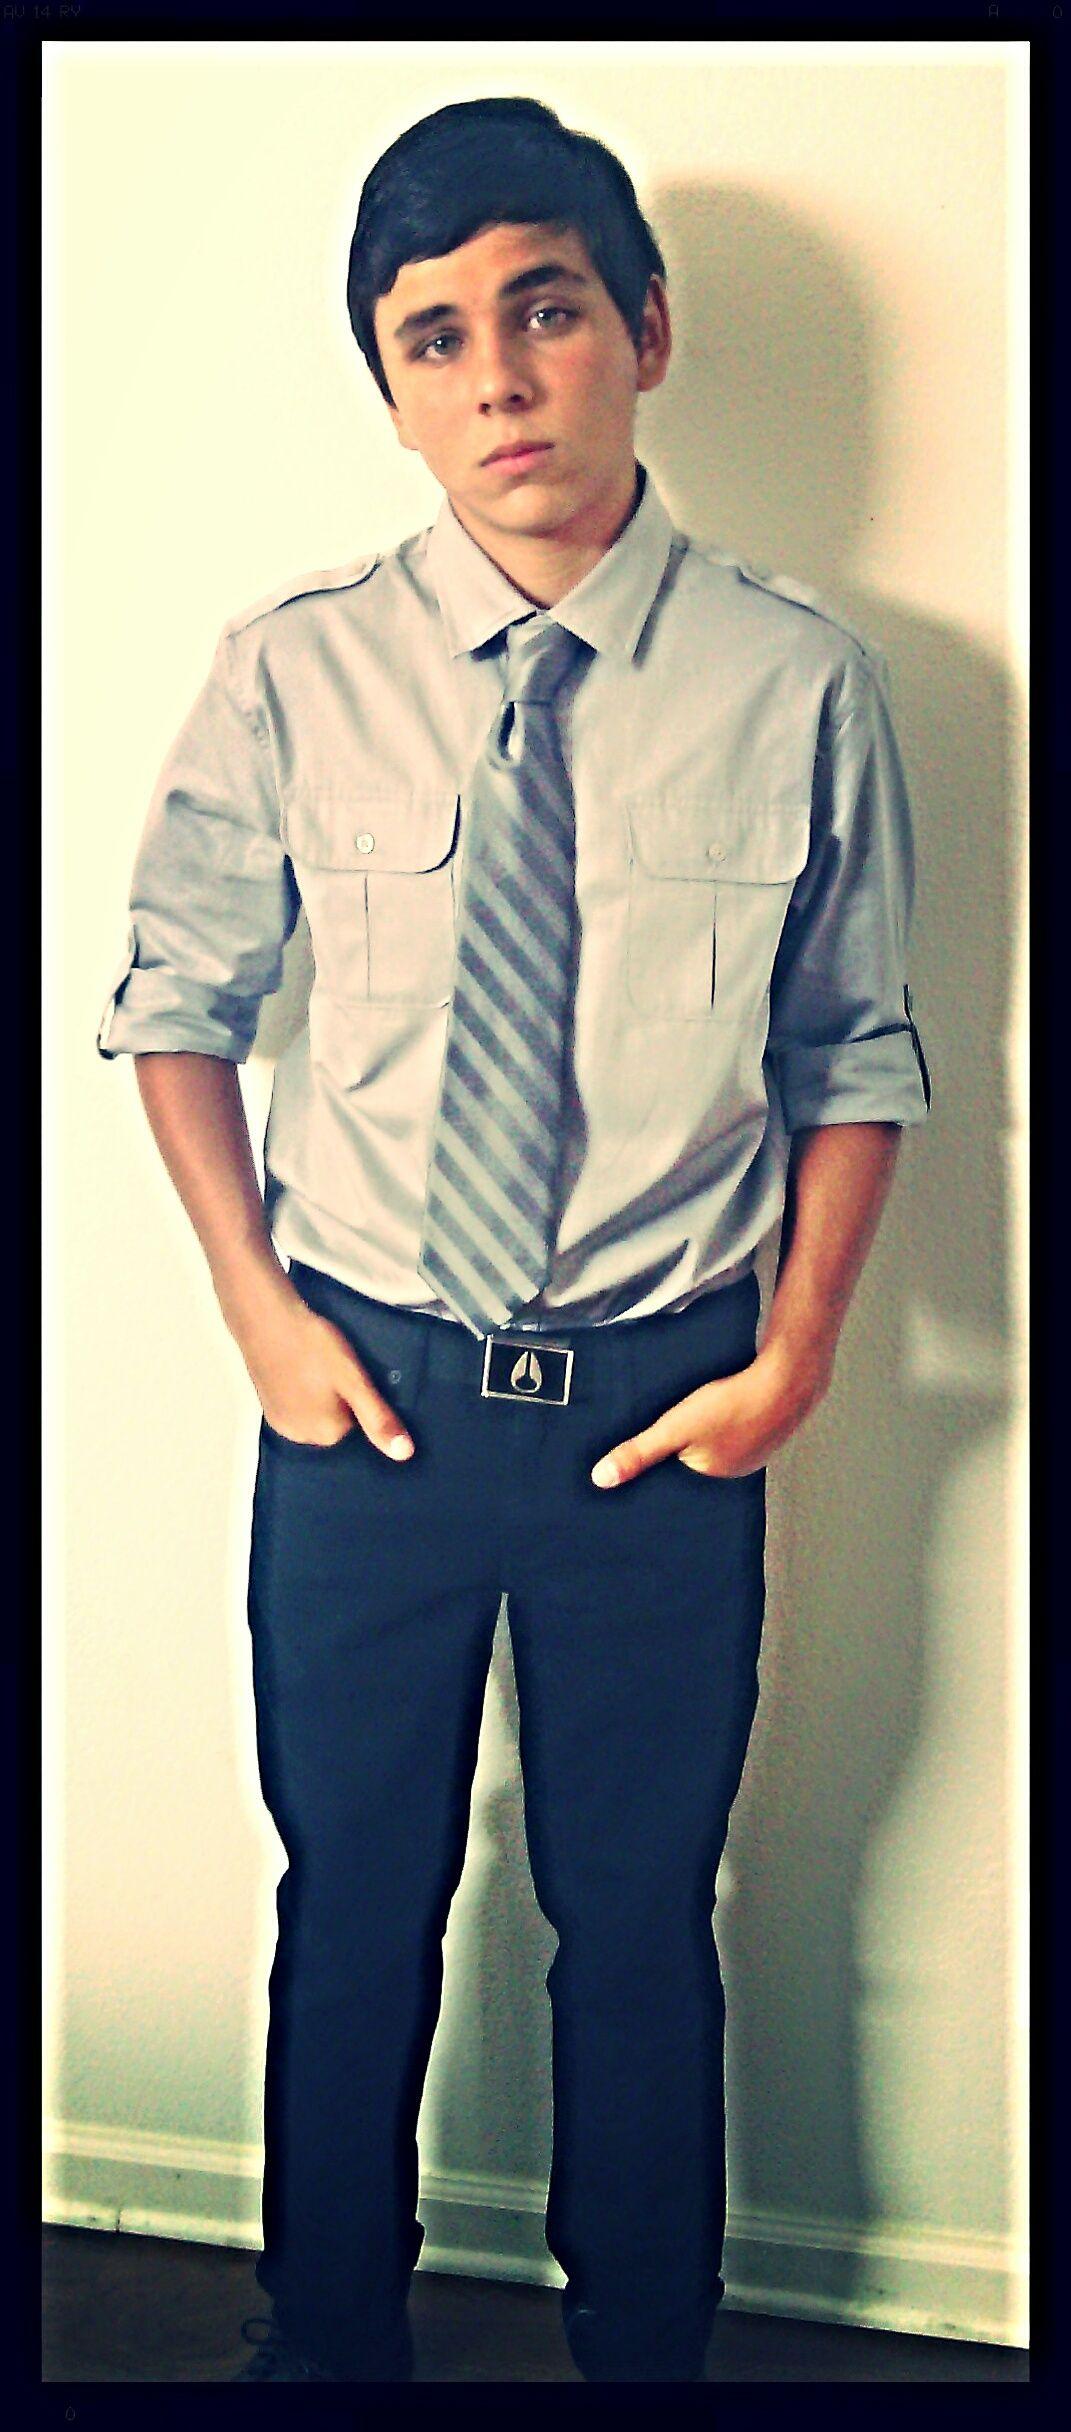 Simi formal look-homecoming dance teen boys | Jordanu0026#39;s look | Pinterest | Homecoming dance Teen ...